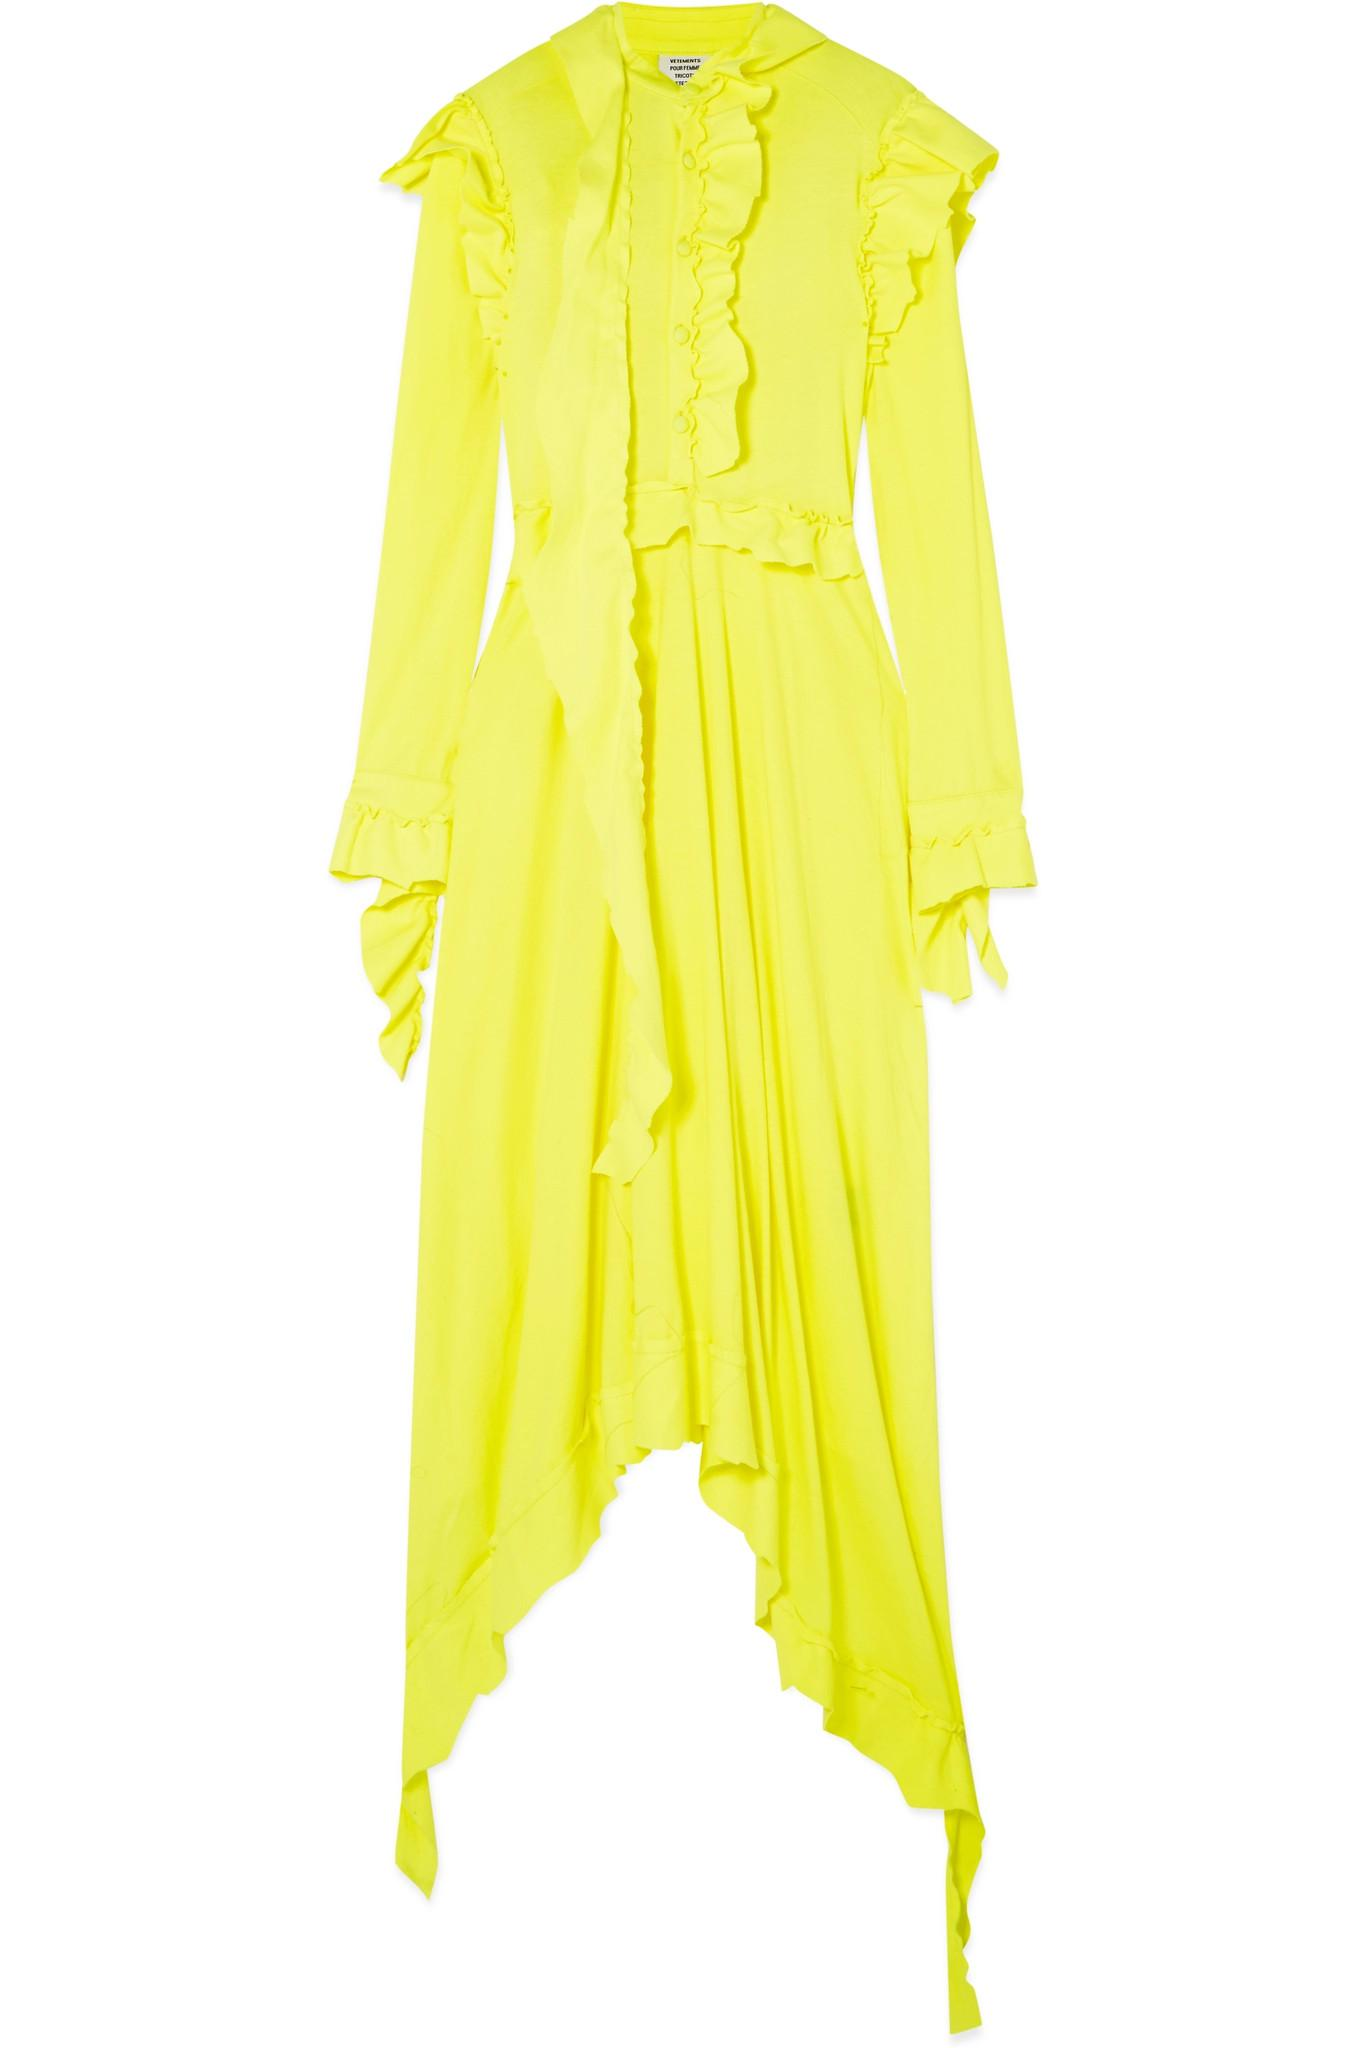 Ruffled cotton dress VETEMENTS Comfortable Online Cheap Footlocker Pictures Sale Deals G3VRYlA1yt